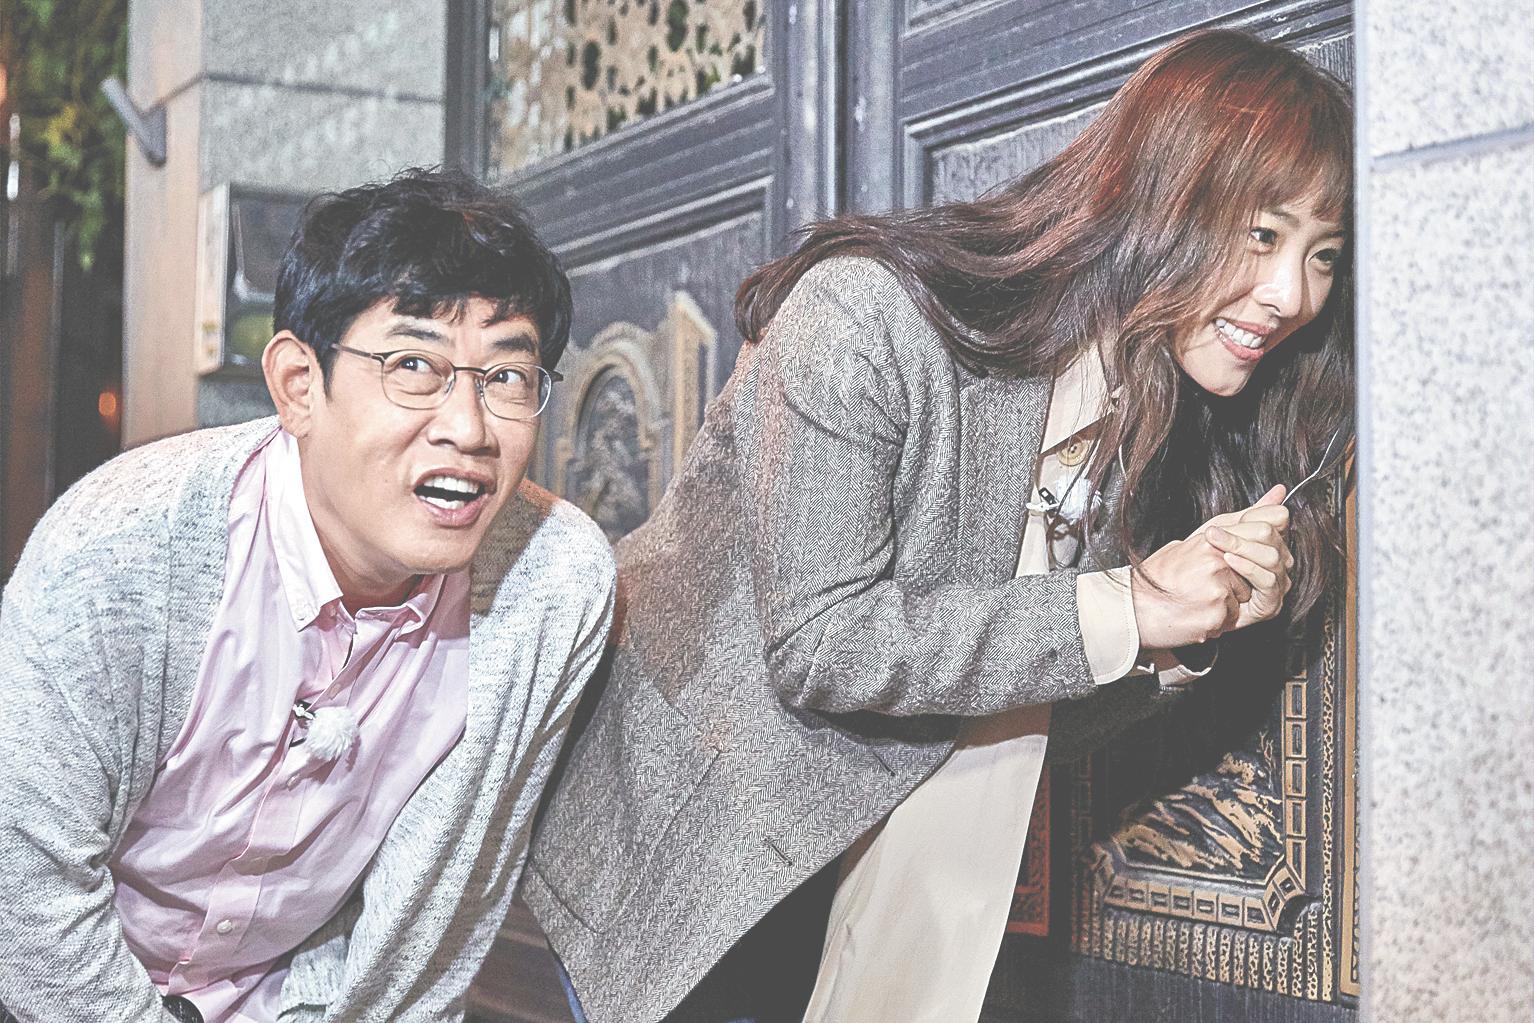 JTBC 예능 프로그램 '한 끼 줍쇼' 출연진이 무작위로 고른 한 집 문을 두드리고 있다. [JTBC]